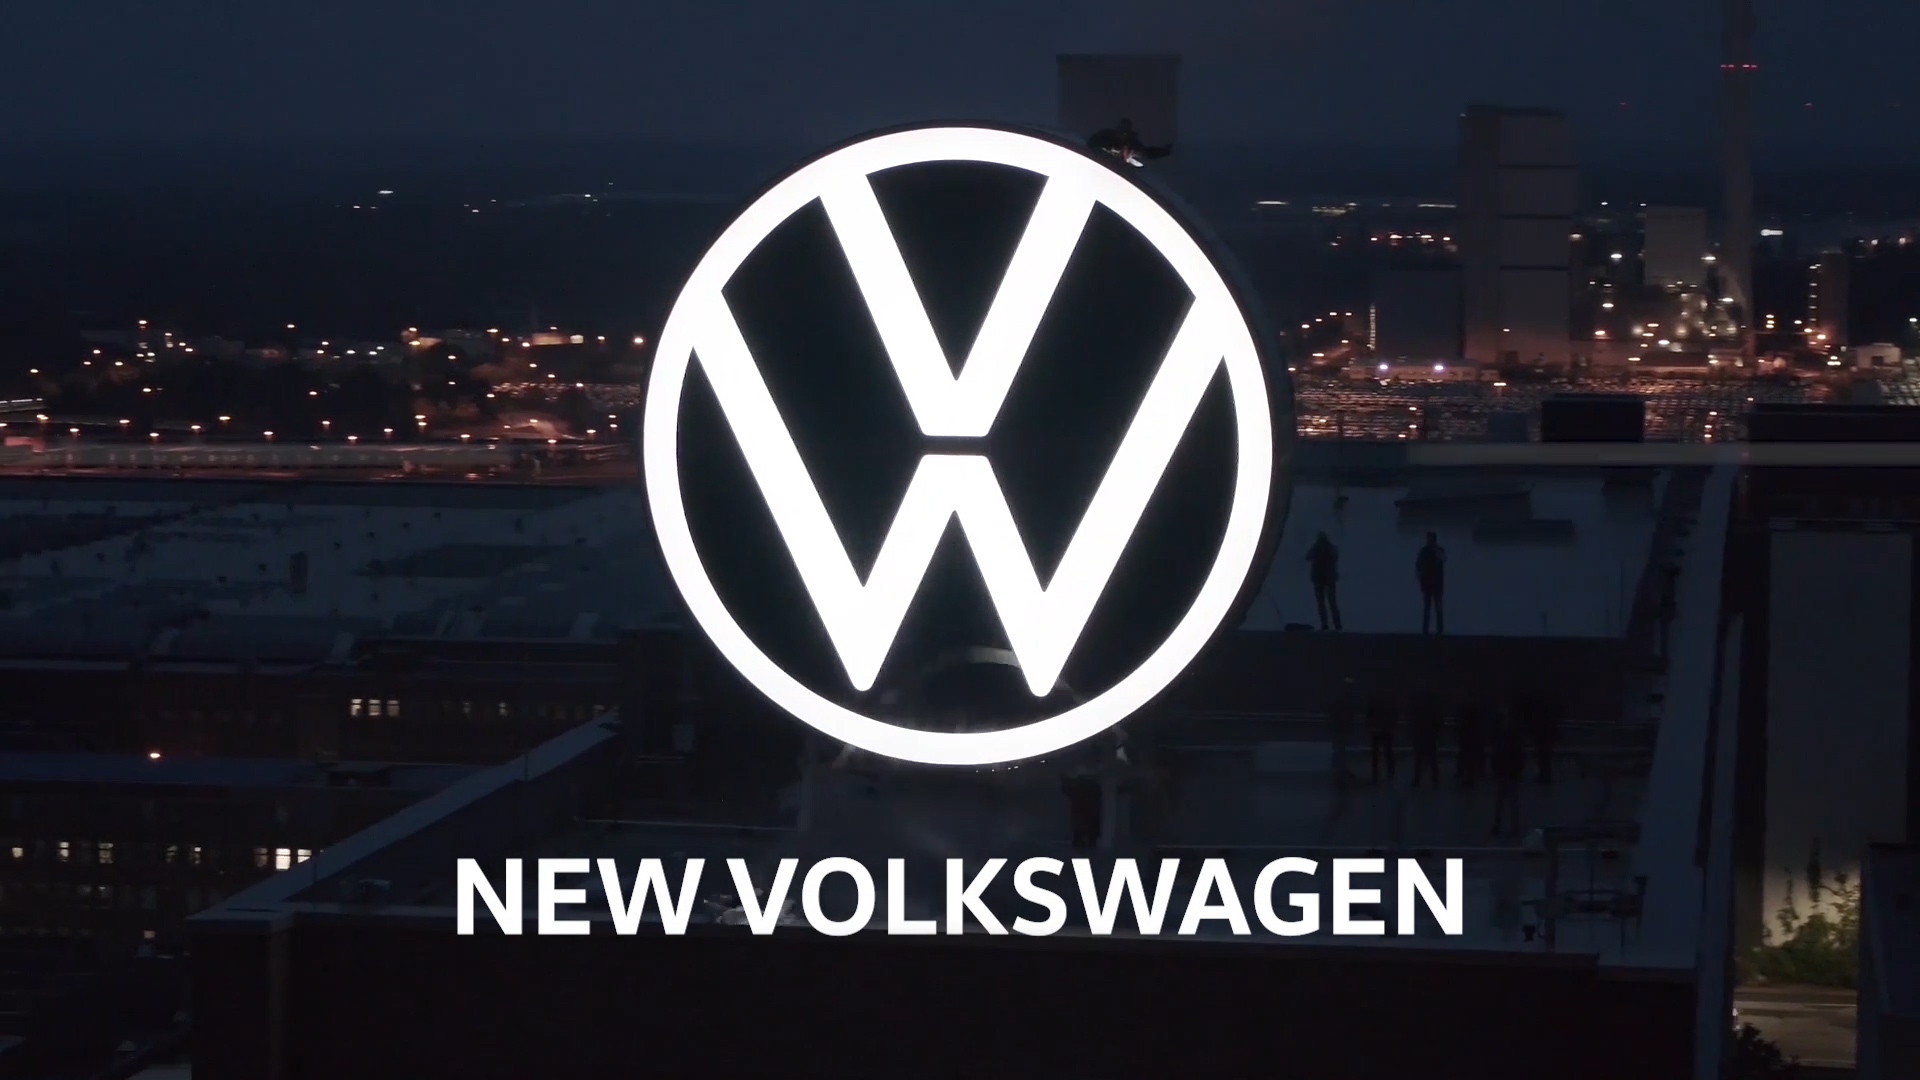 VW jahrsrückblick 2019_01.jpg